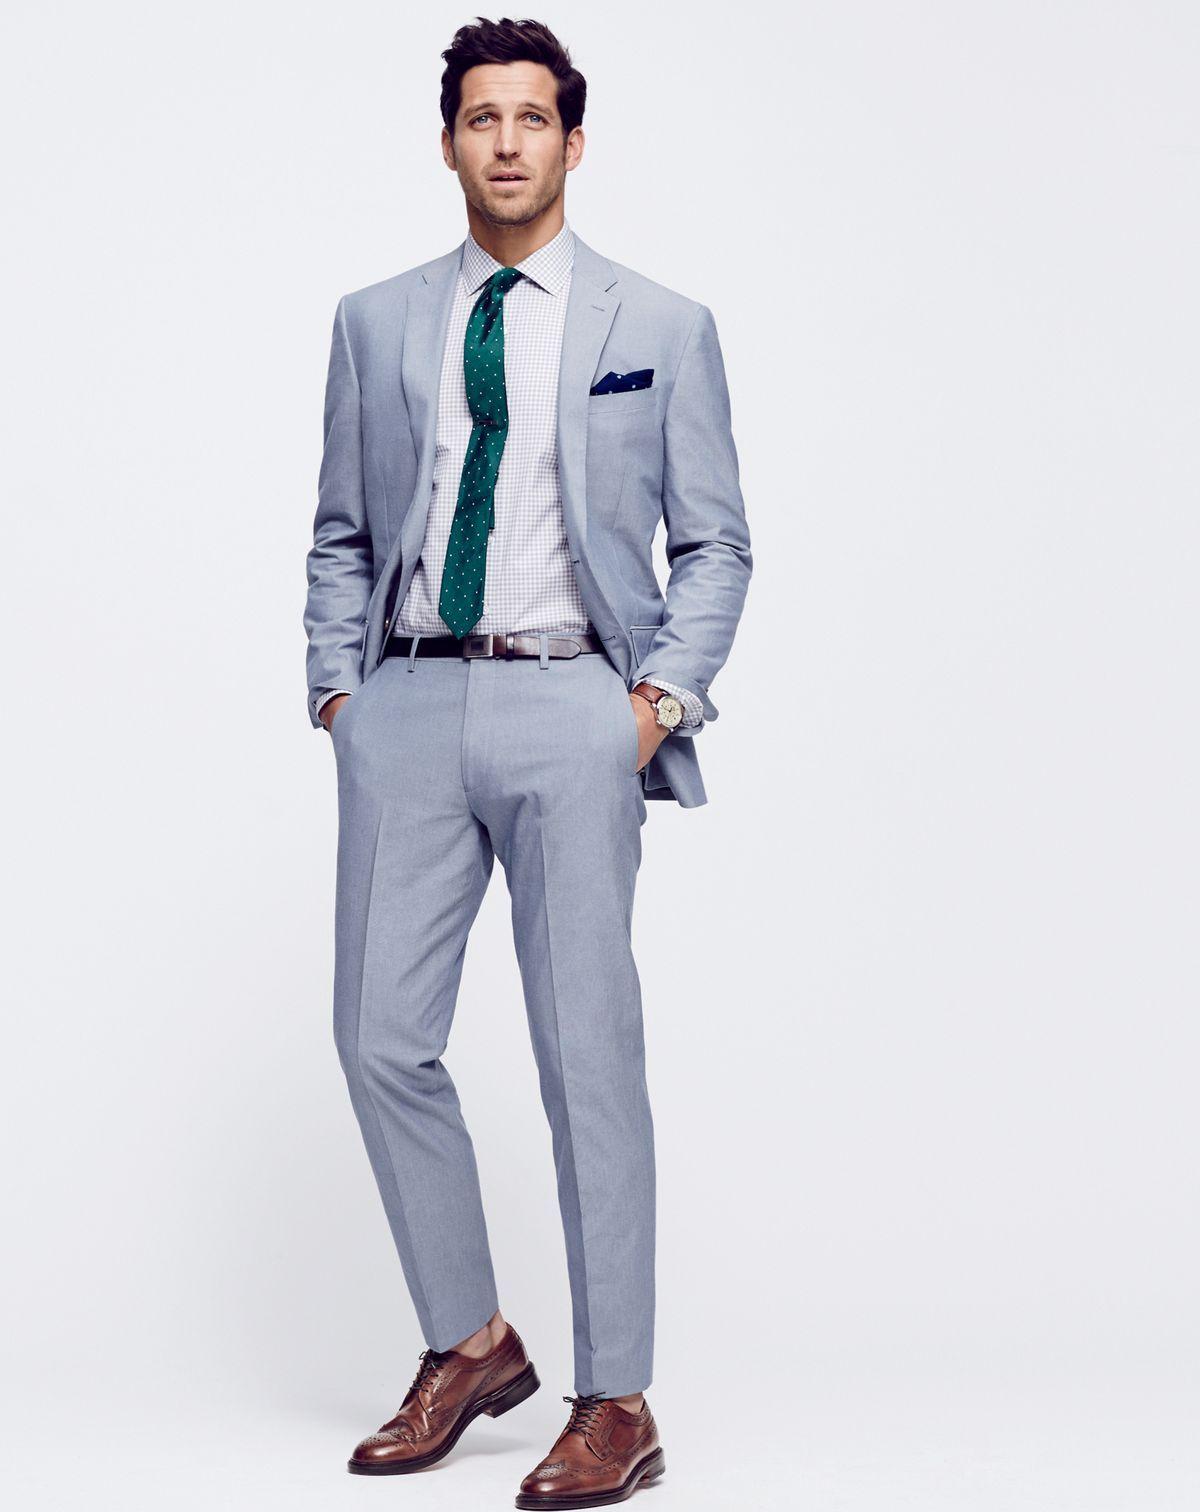 3df5fa5b7c010 J.Crew men s Crosby suit in Italian cotton oxford cloth